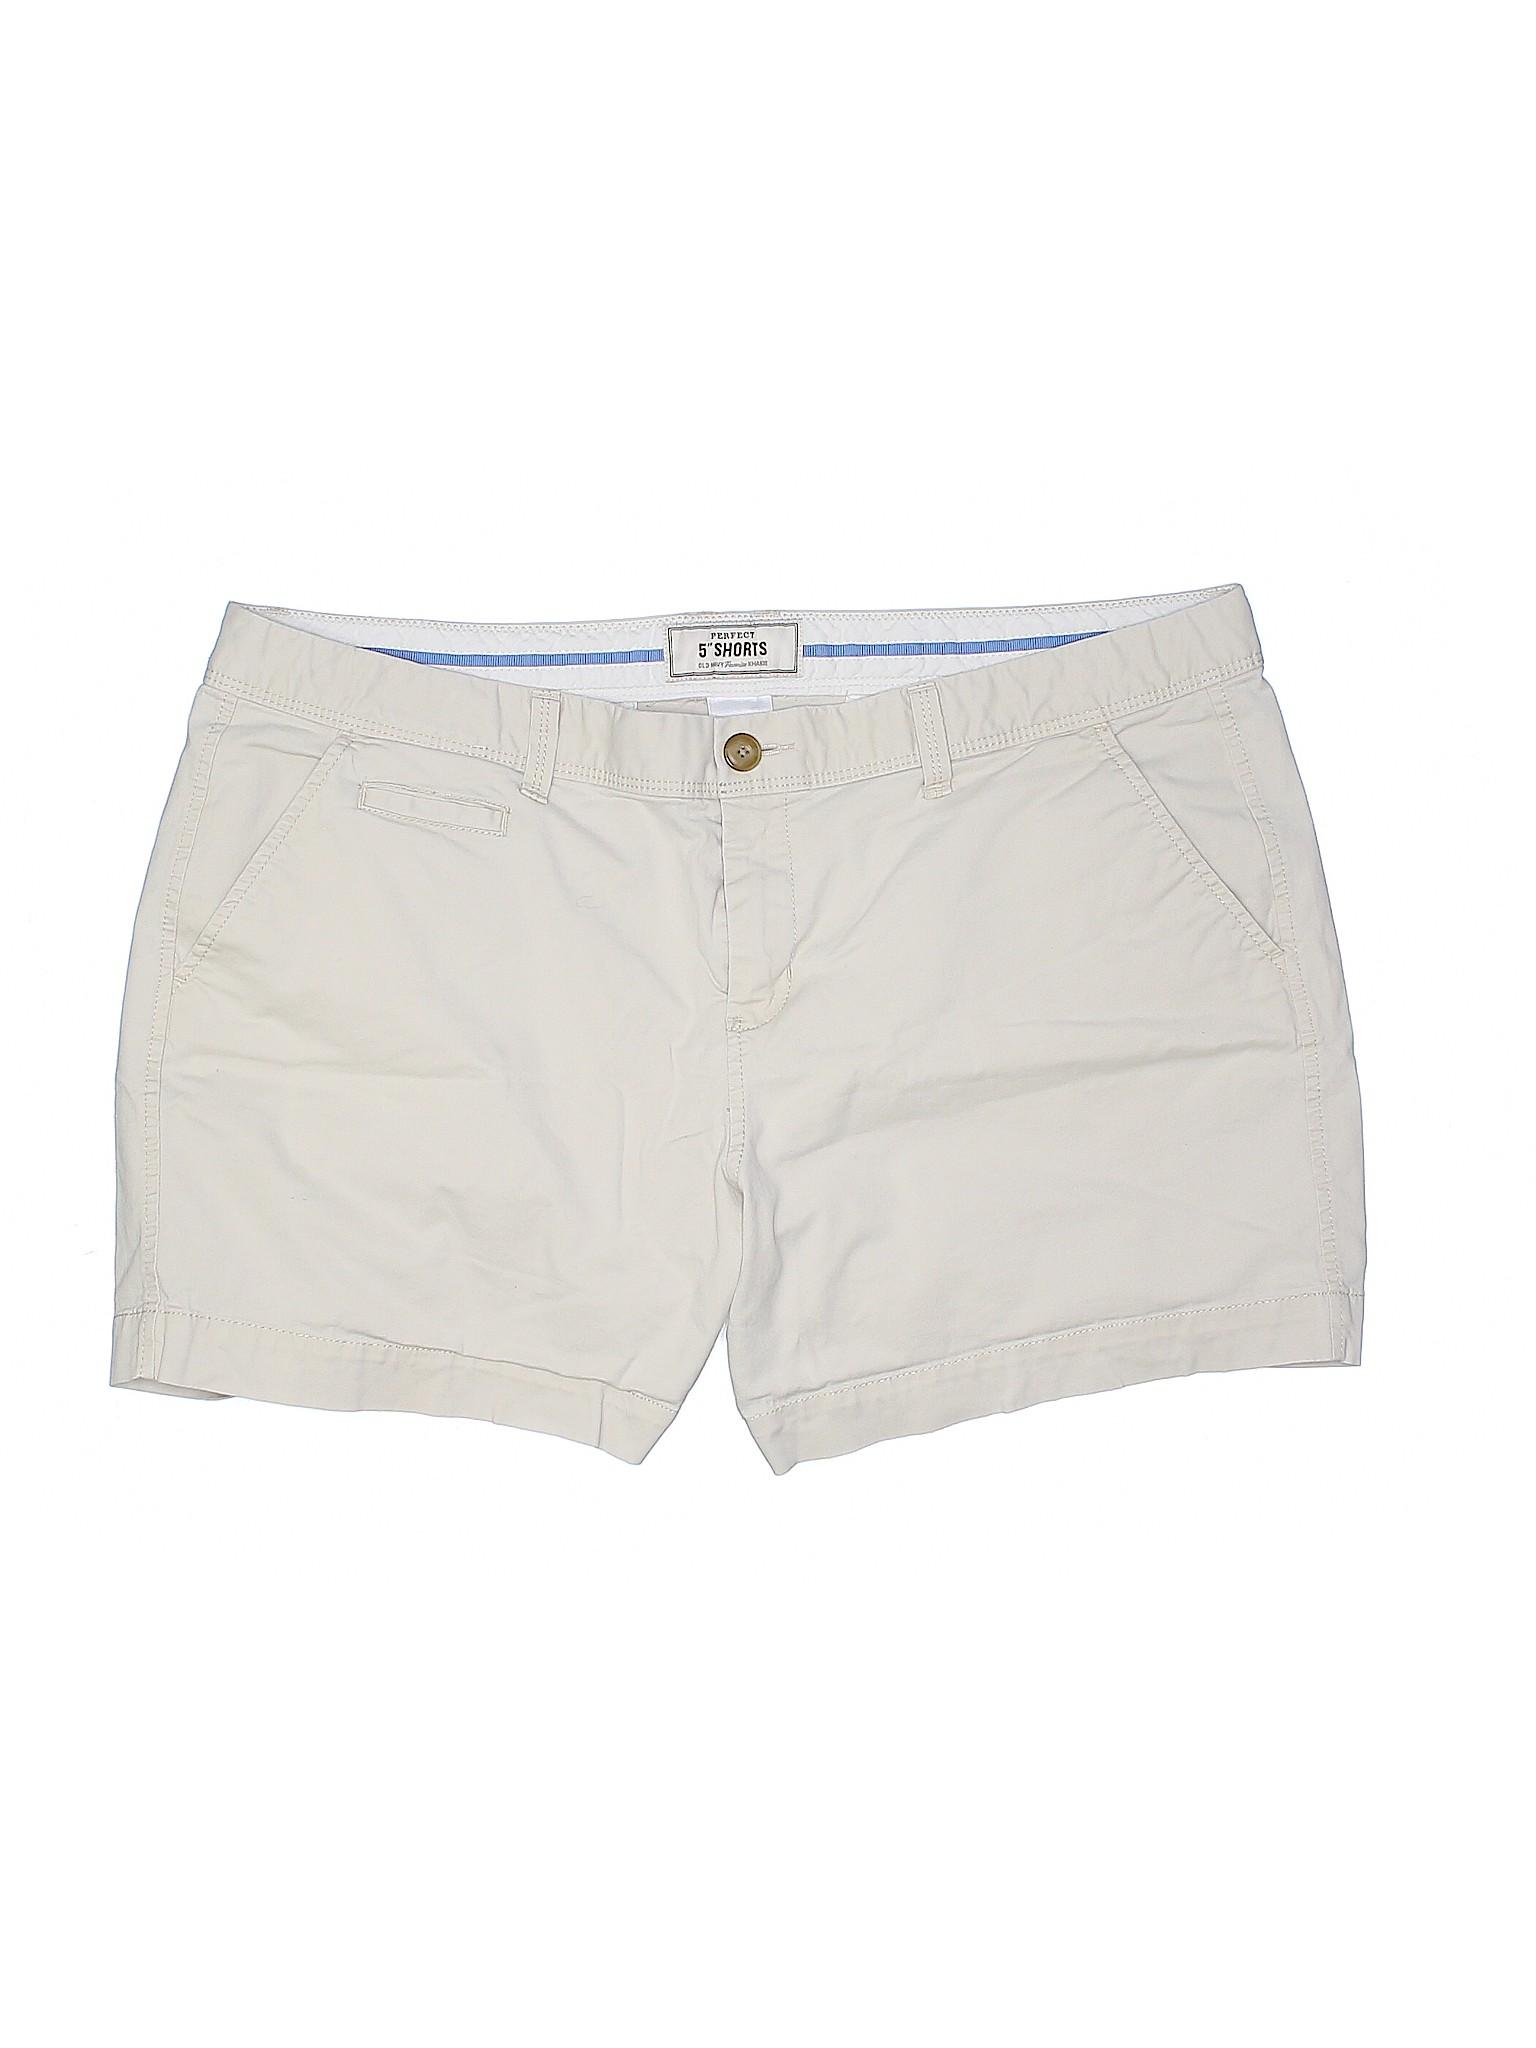 Shorts Boutique Old leisure Khaki Navy IBB8qxwC